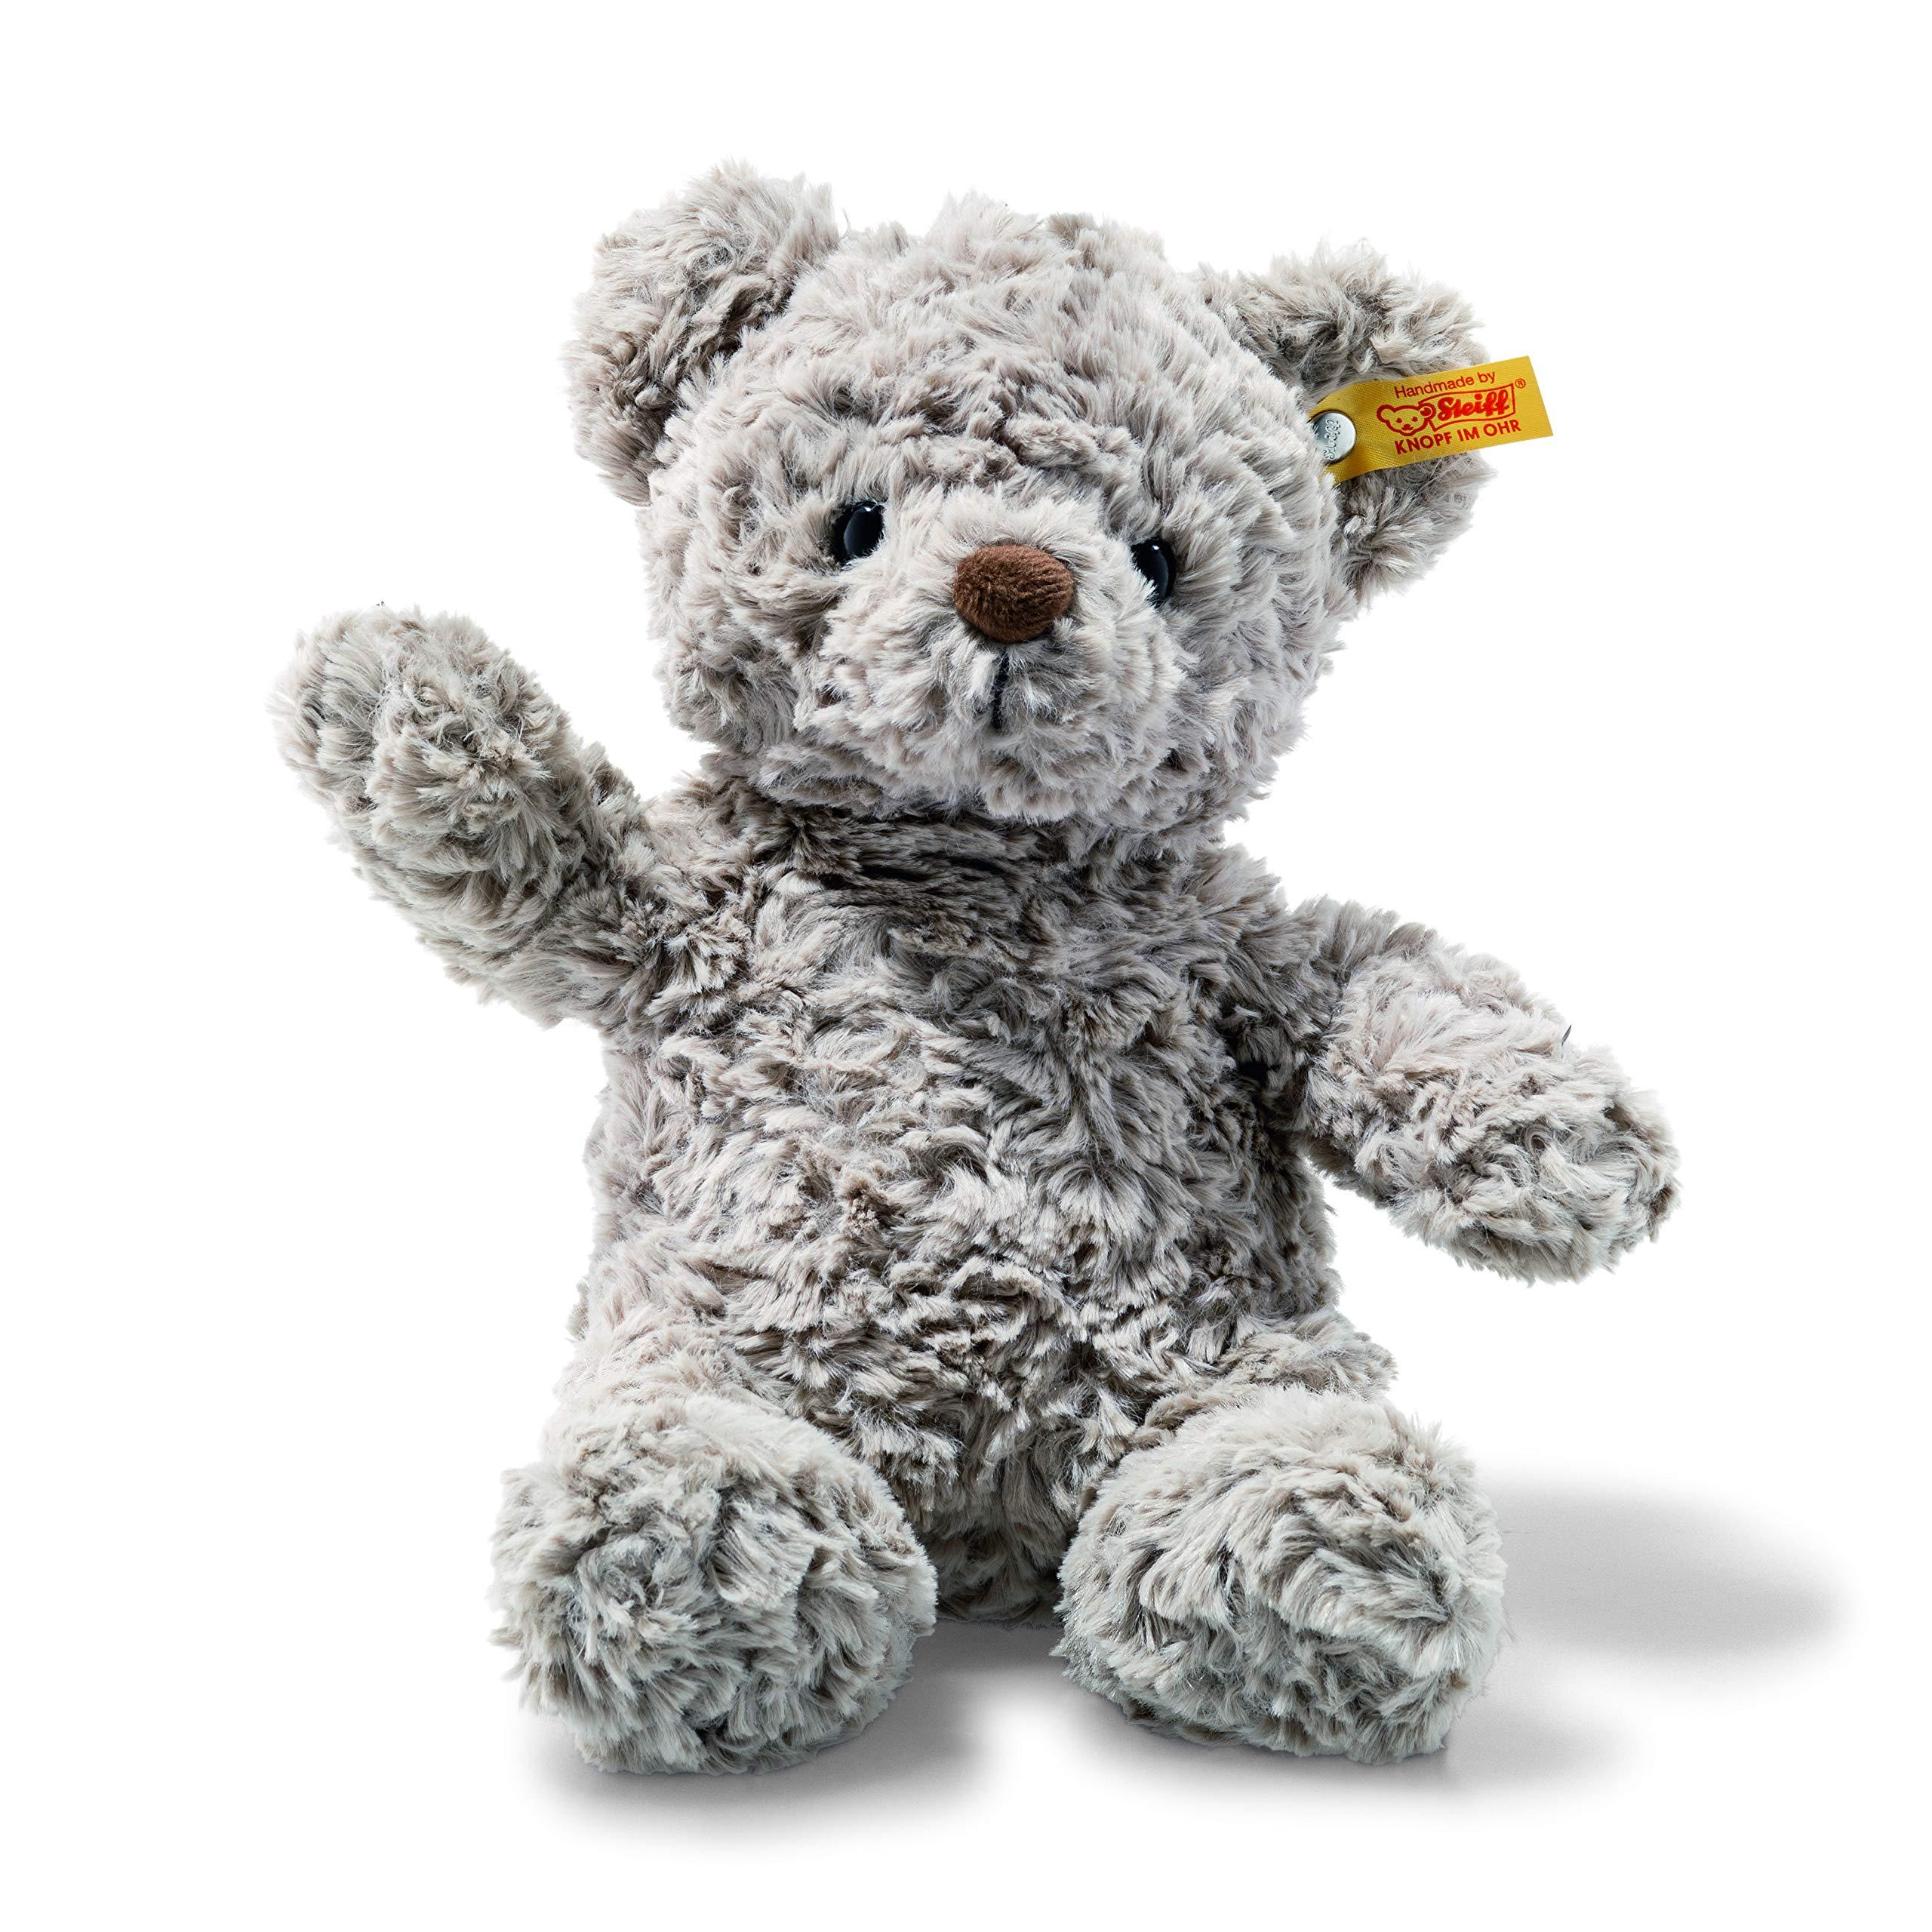 Steiff Vintage Teddy Bear - Soft And Cuddly Plush Animal Toy - 12'' Authentic Steiff by Steiff